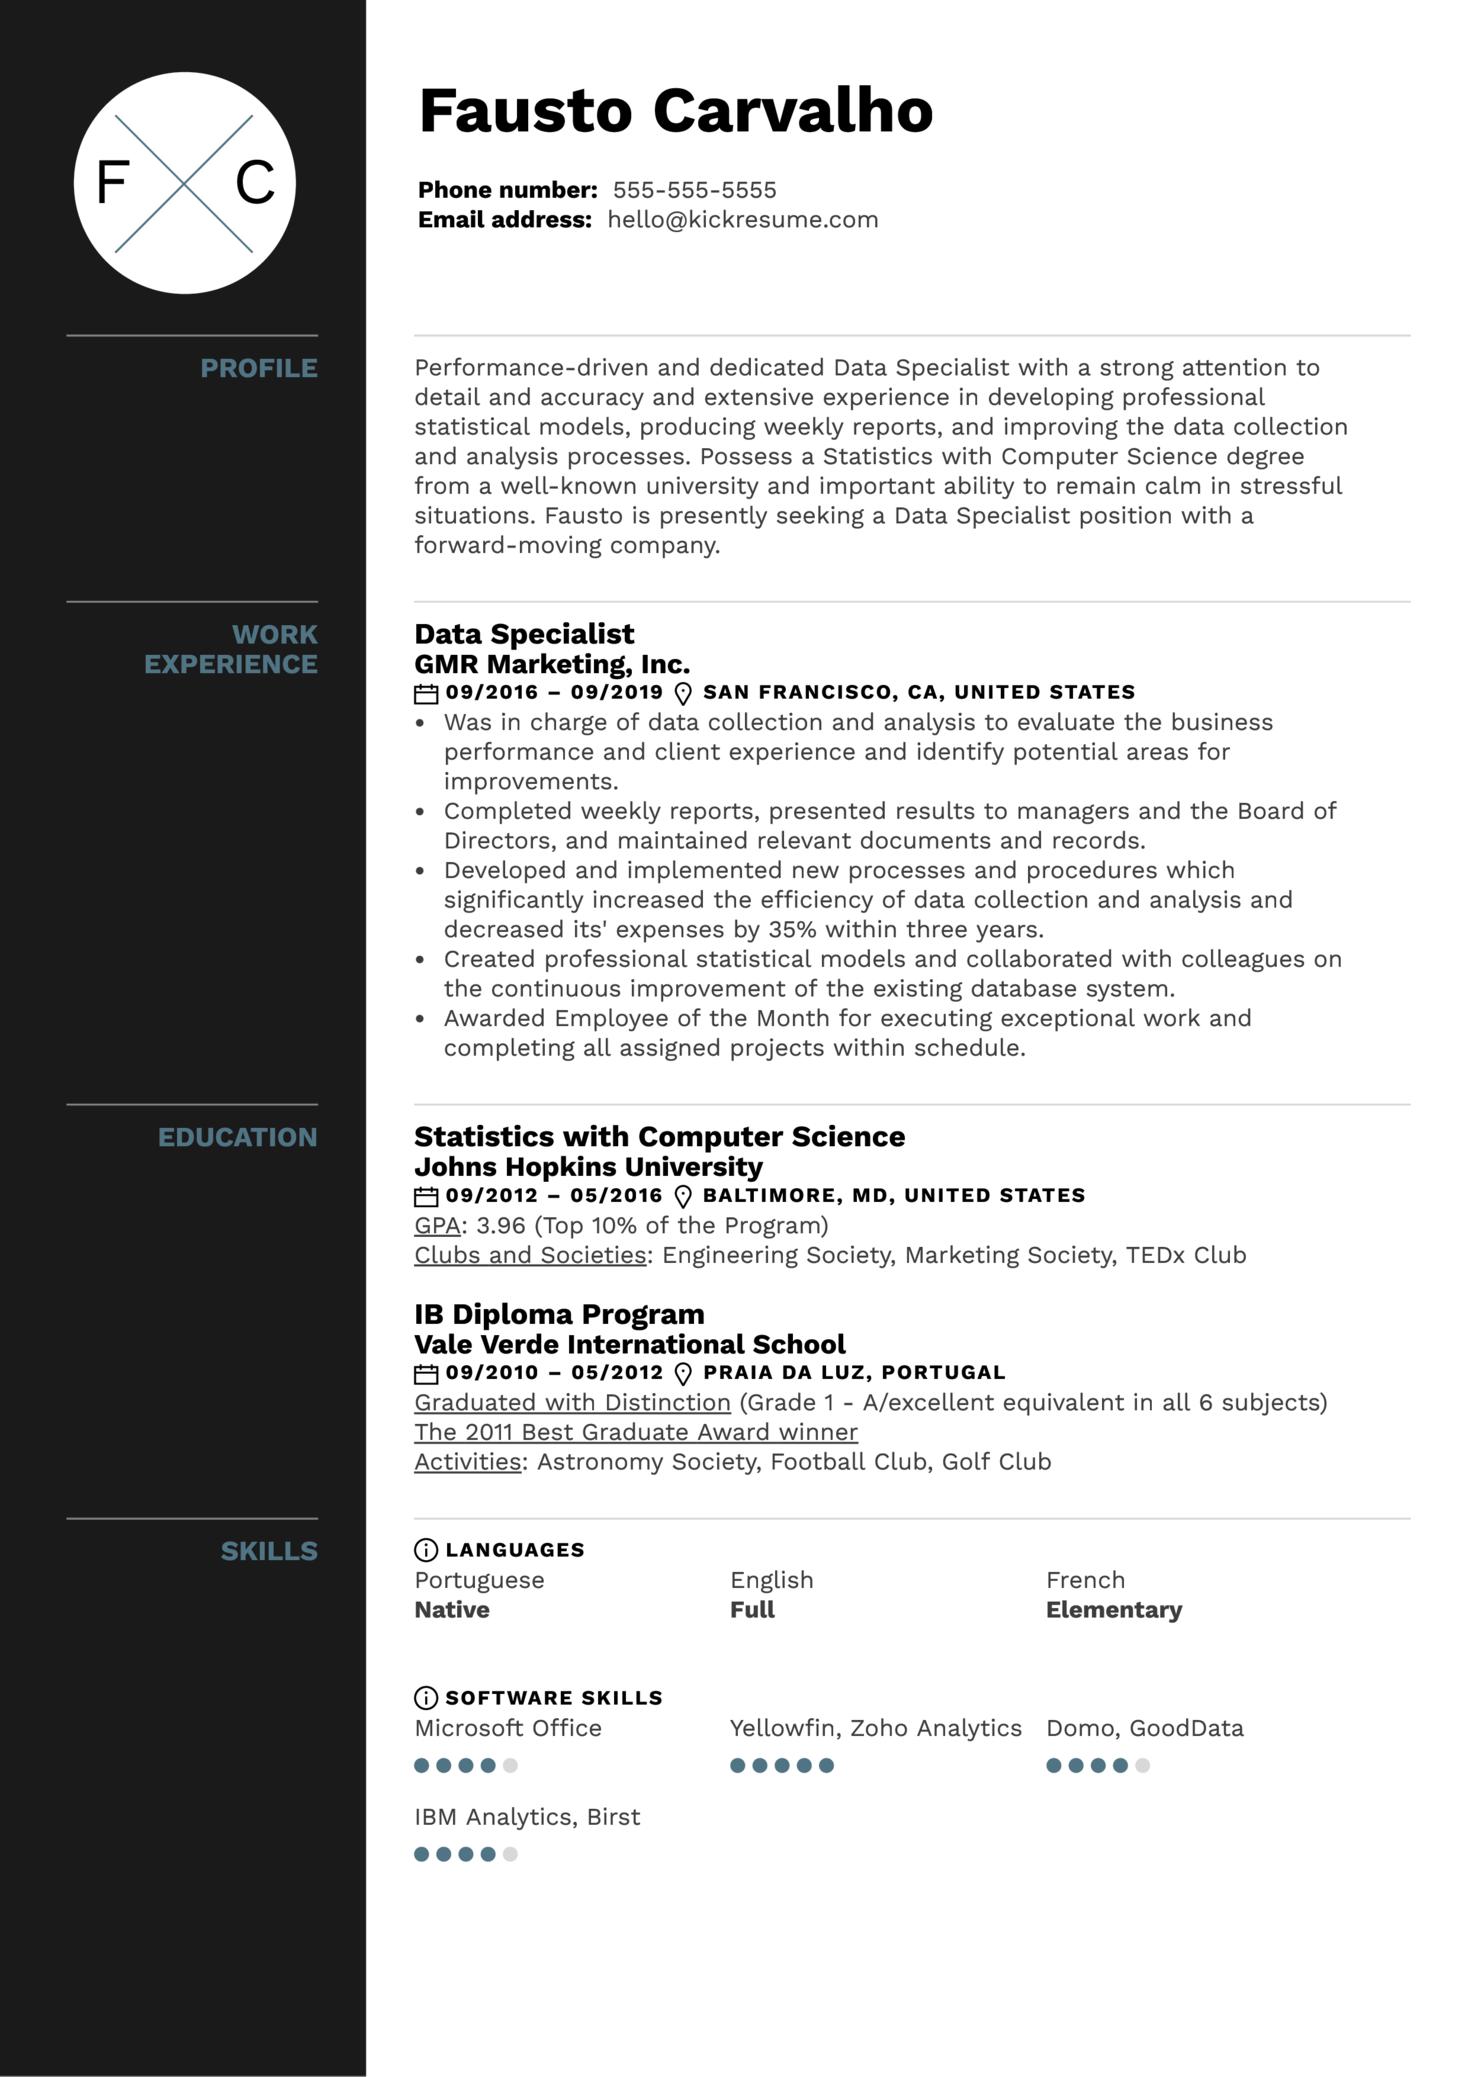 Data Specialist Resume Example (parte 1)